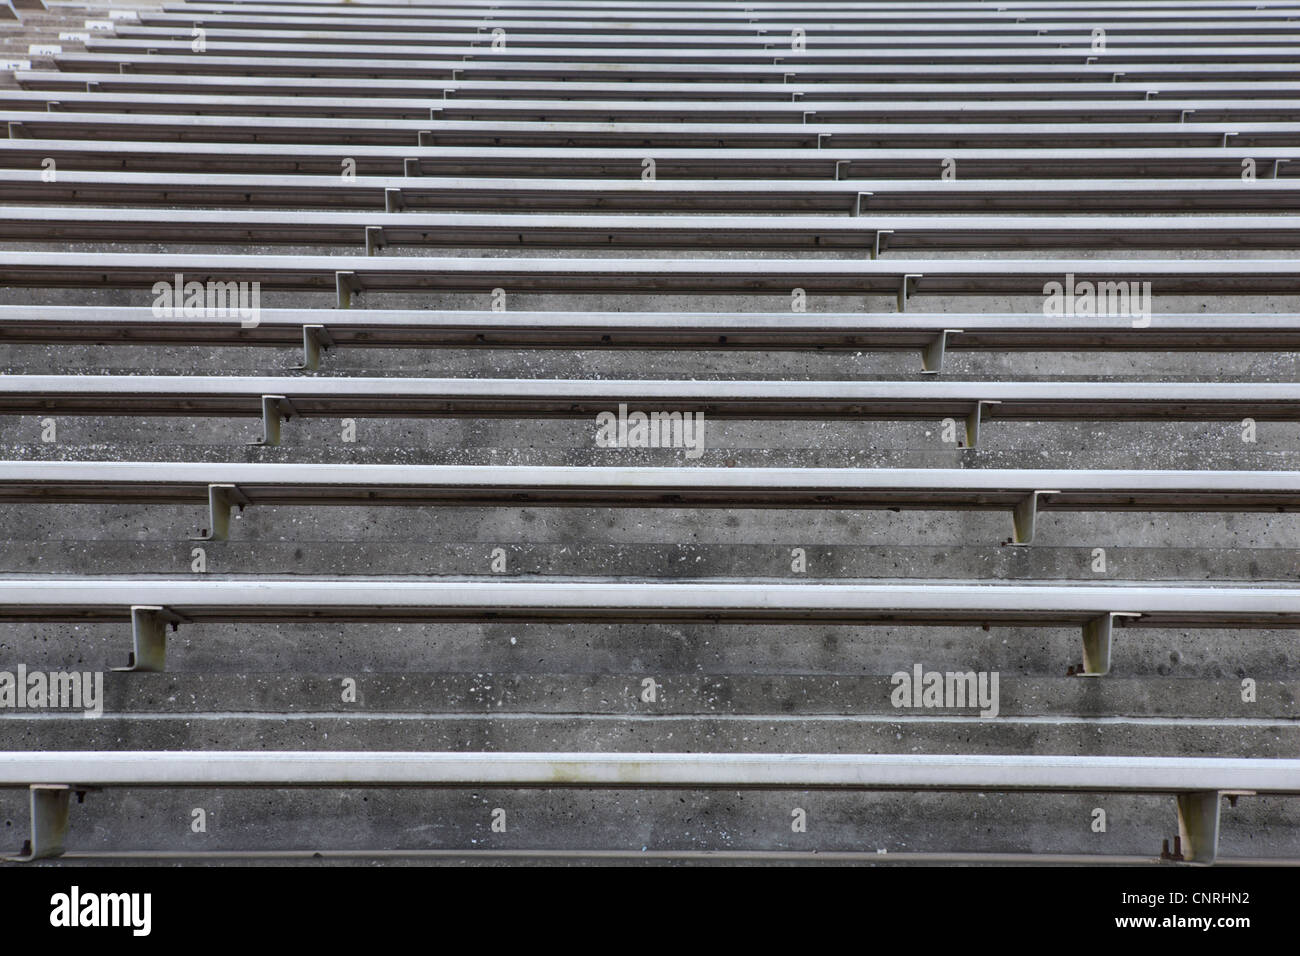 Des gradins du stade vide Photo Stock